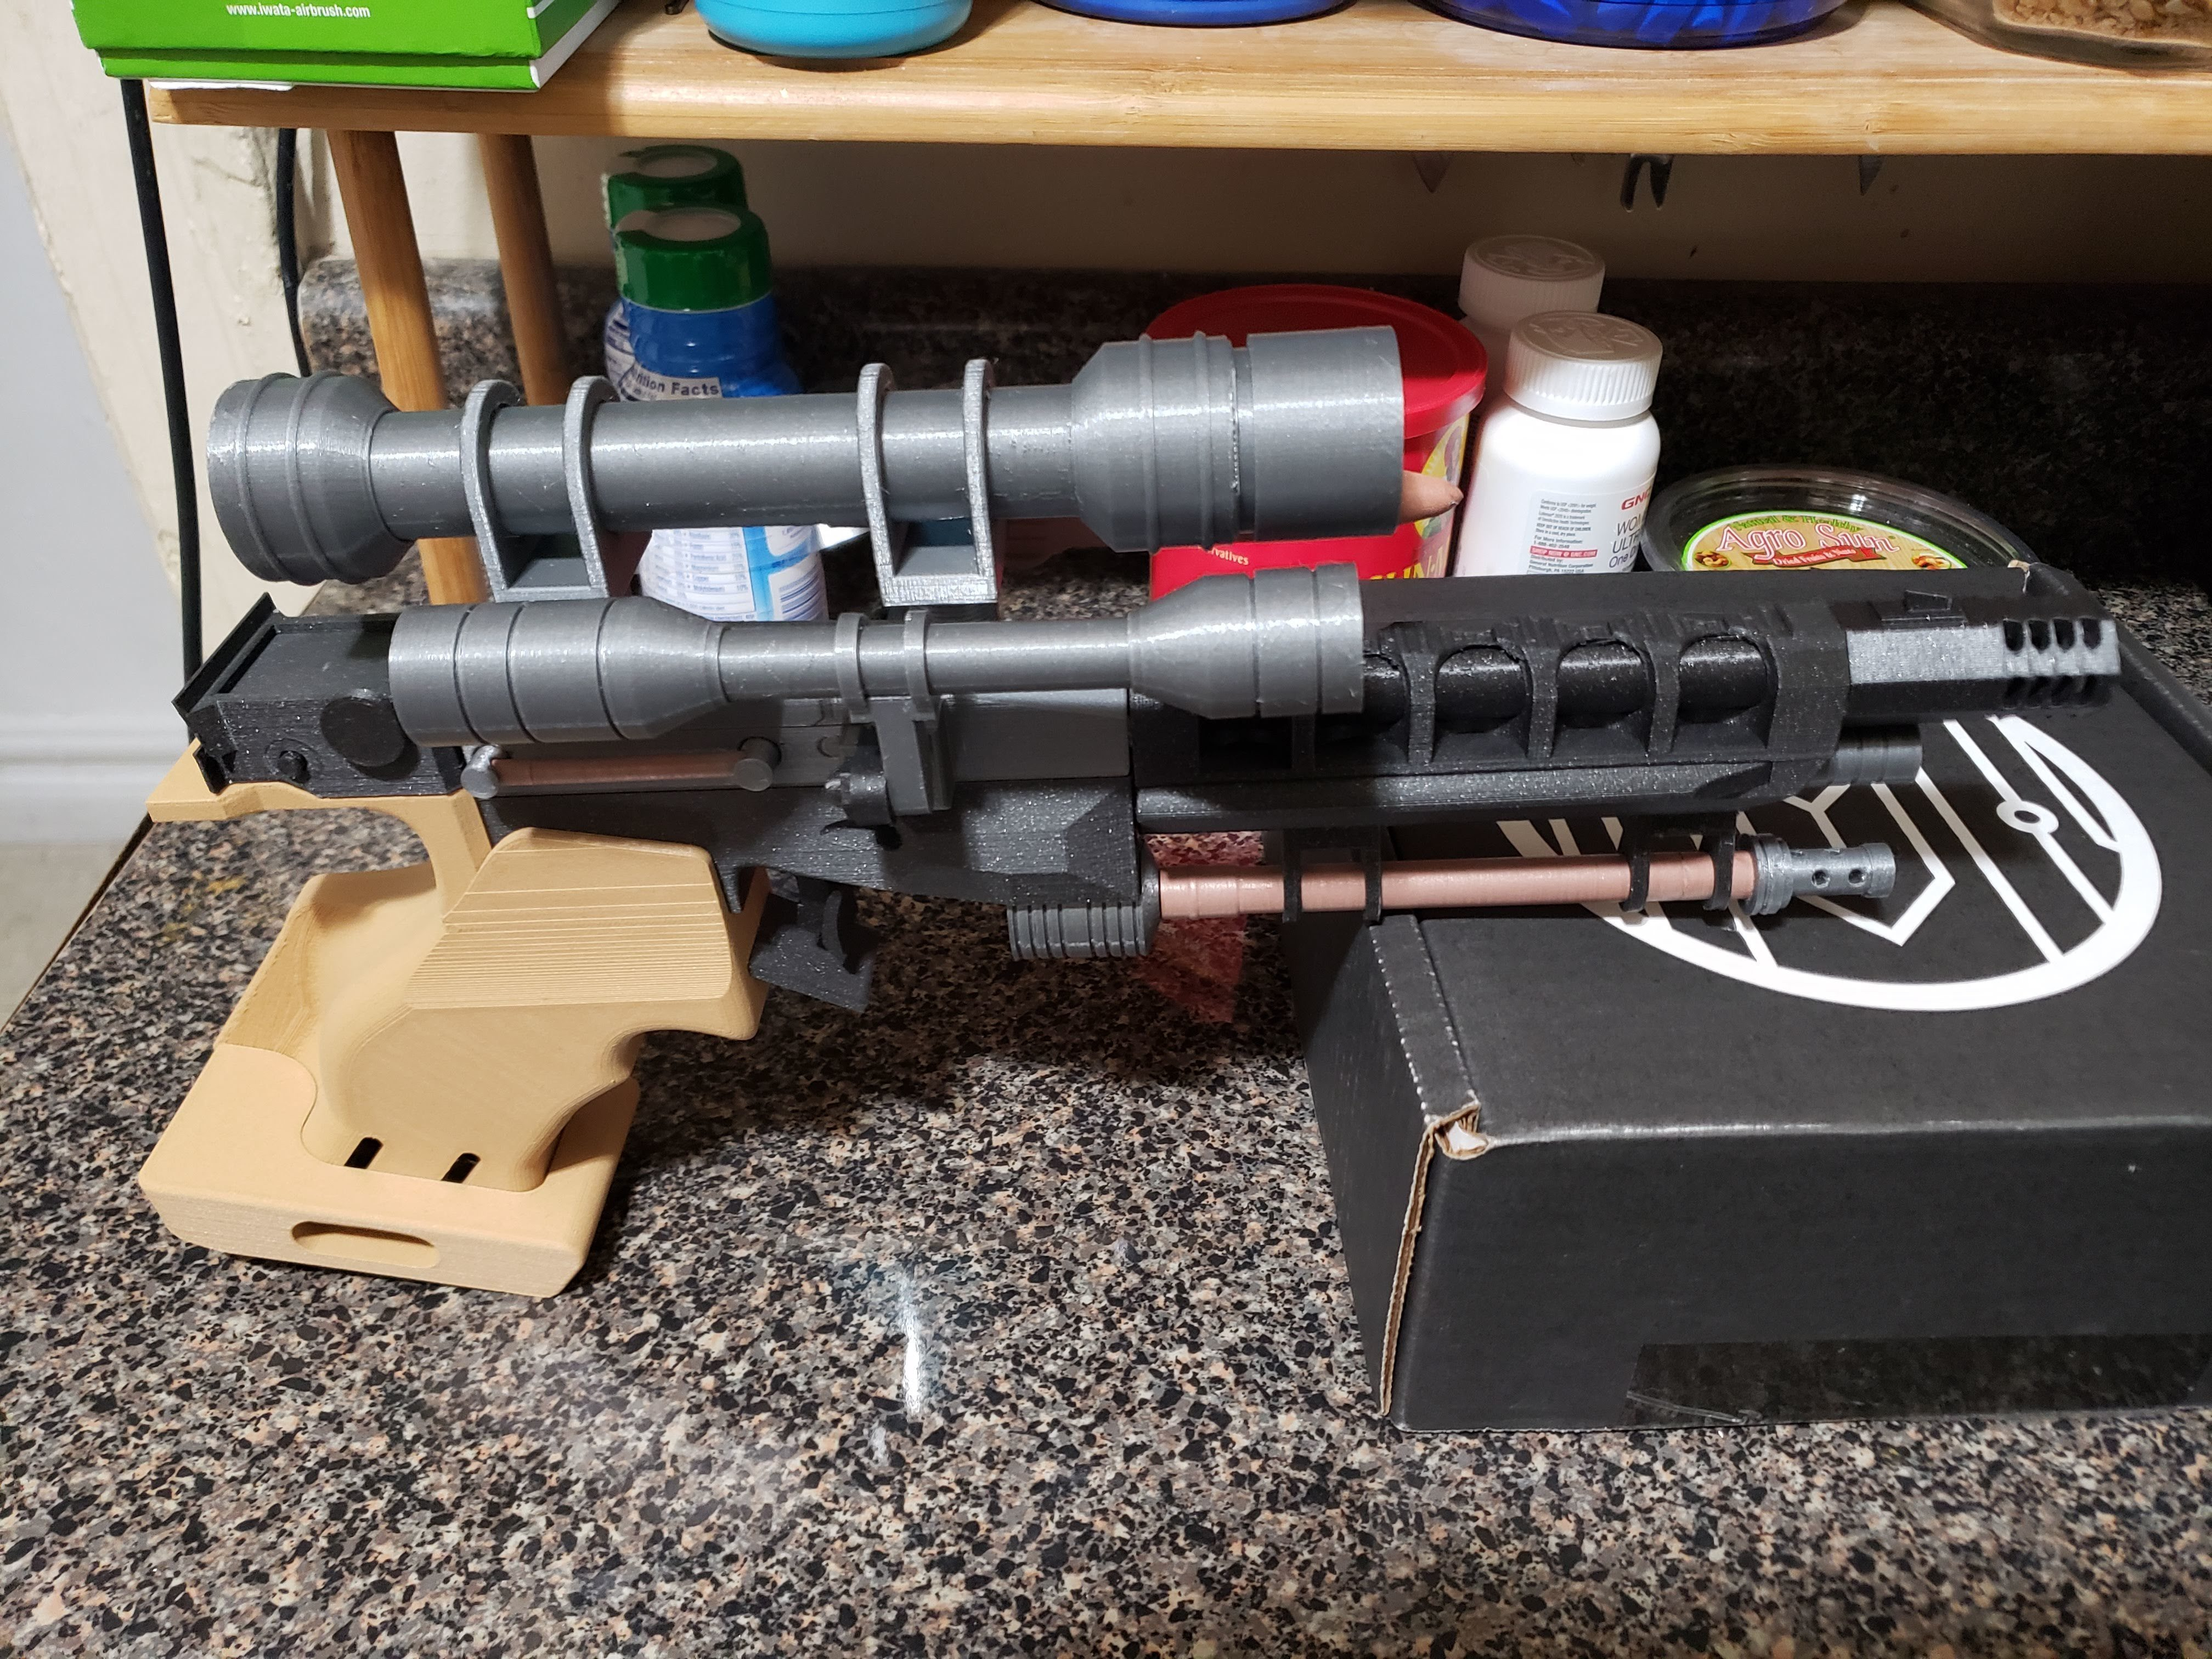 20190205_234631.jpg Download free STL file Star Wars Naboo S5 Heavy Blaster Pistol • 3D printing design, Dsk